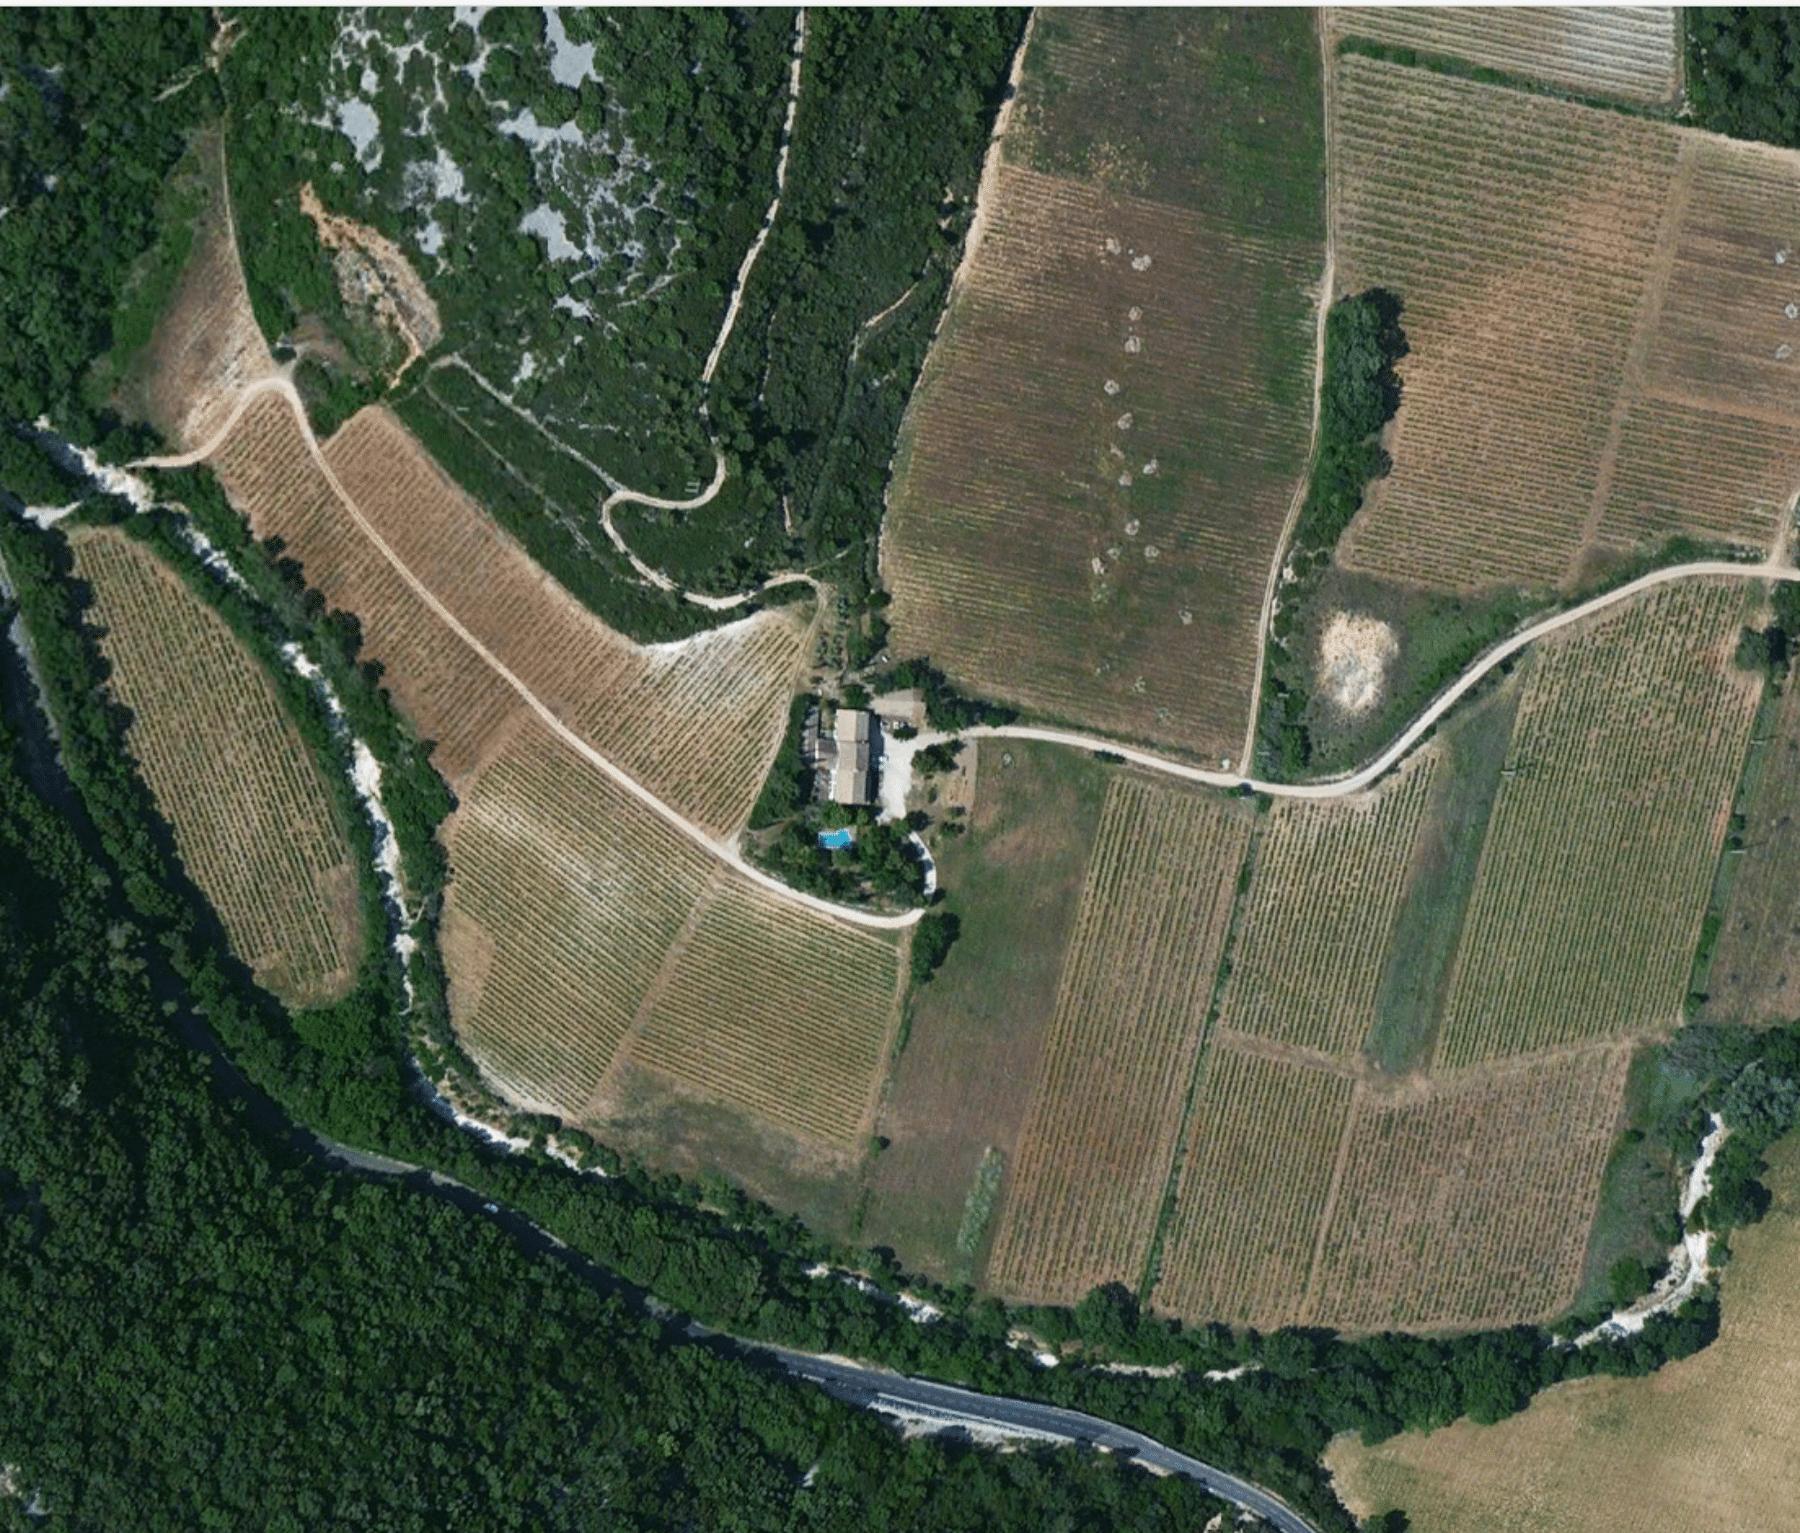 Domaine viticole de Poujol